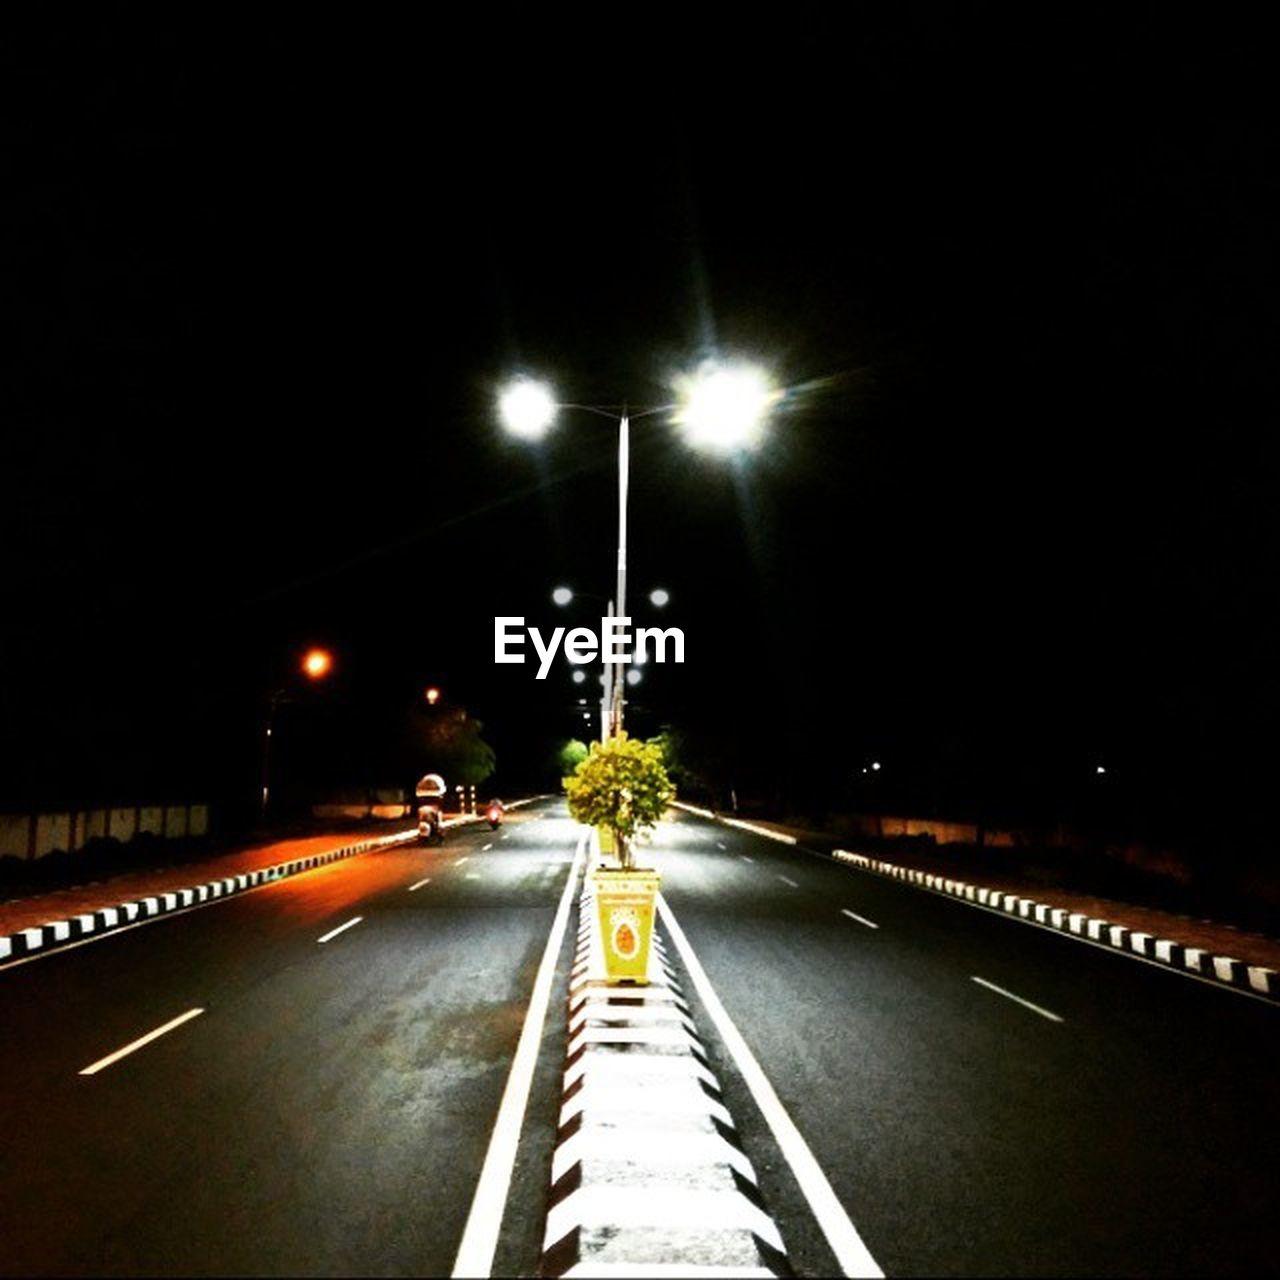 illuminated, night, street light, road, transportation, light trail, the way forward, no people, outdoors, high street, sky